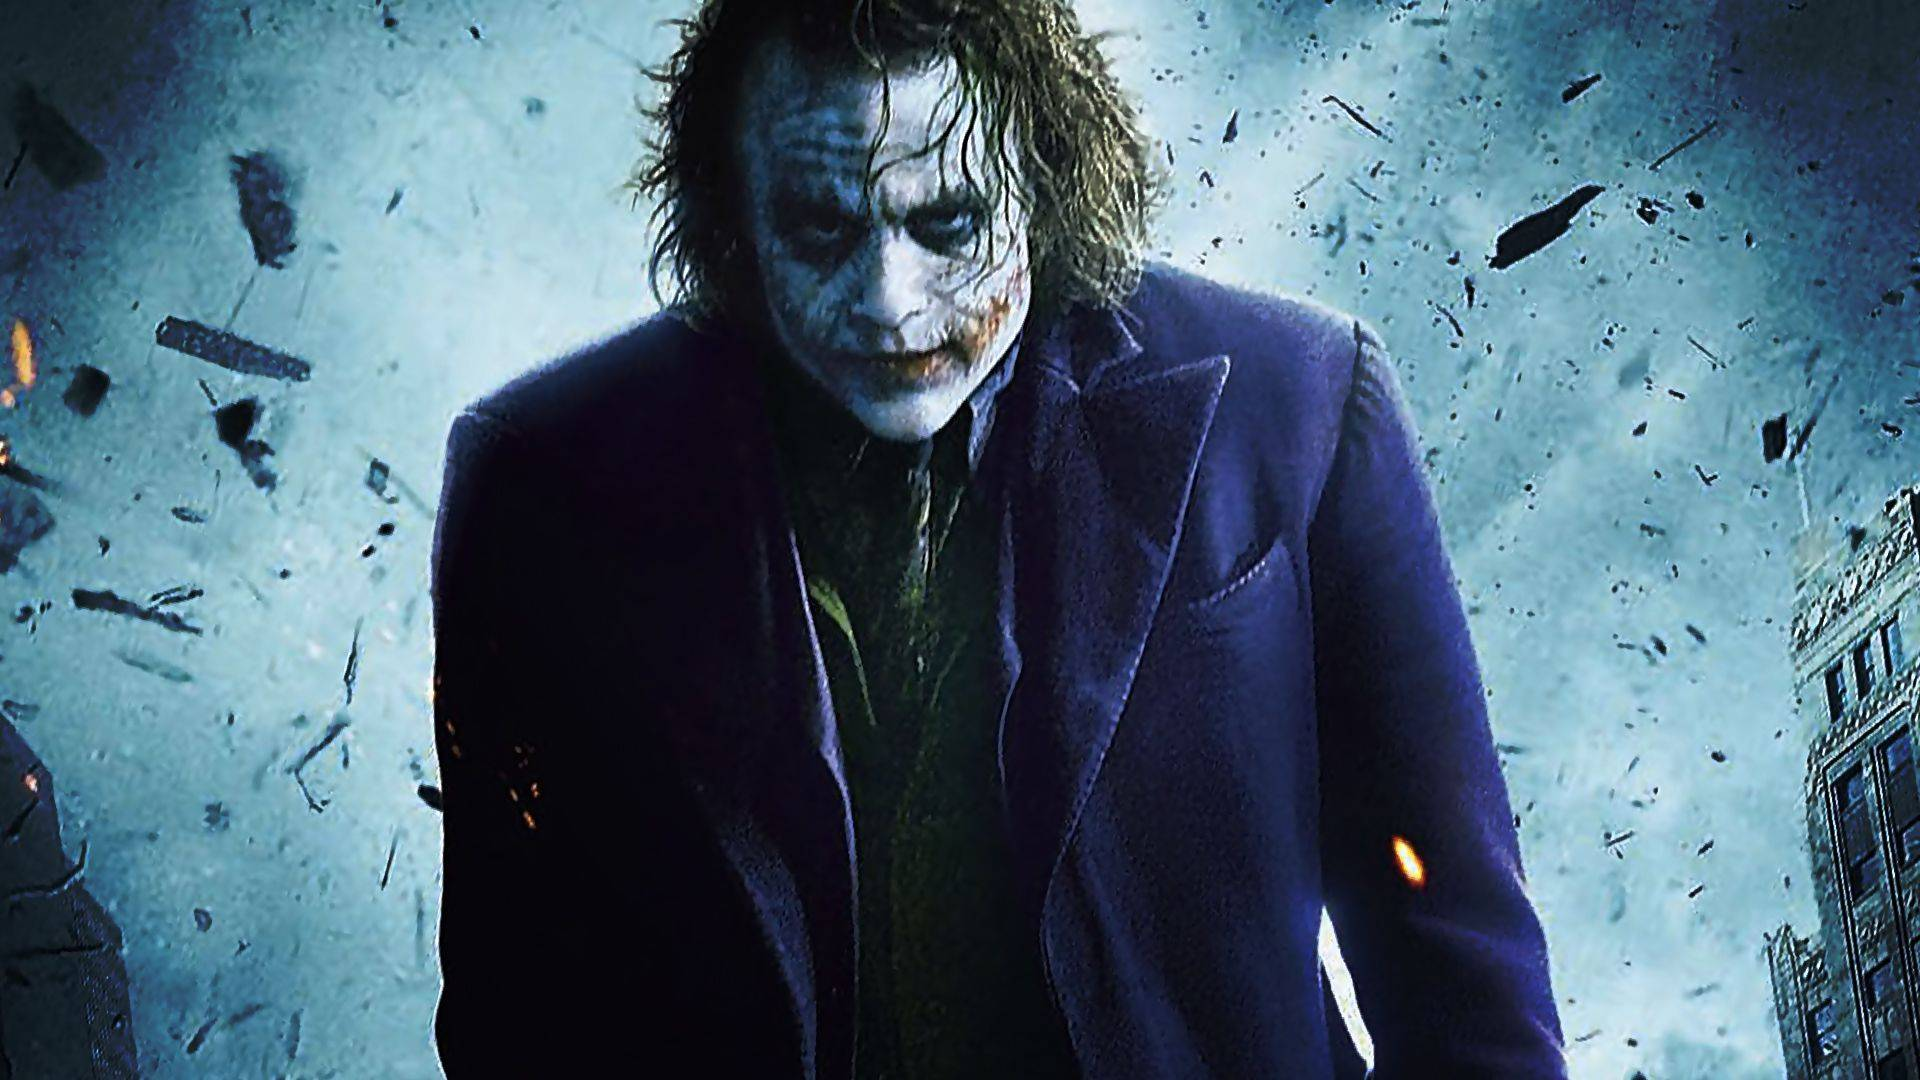 The Joker The Dark Knight   Heath Ledger Heath Ledger played one of 1920x1080